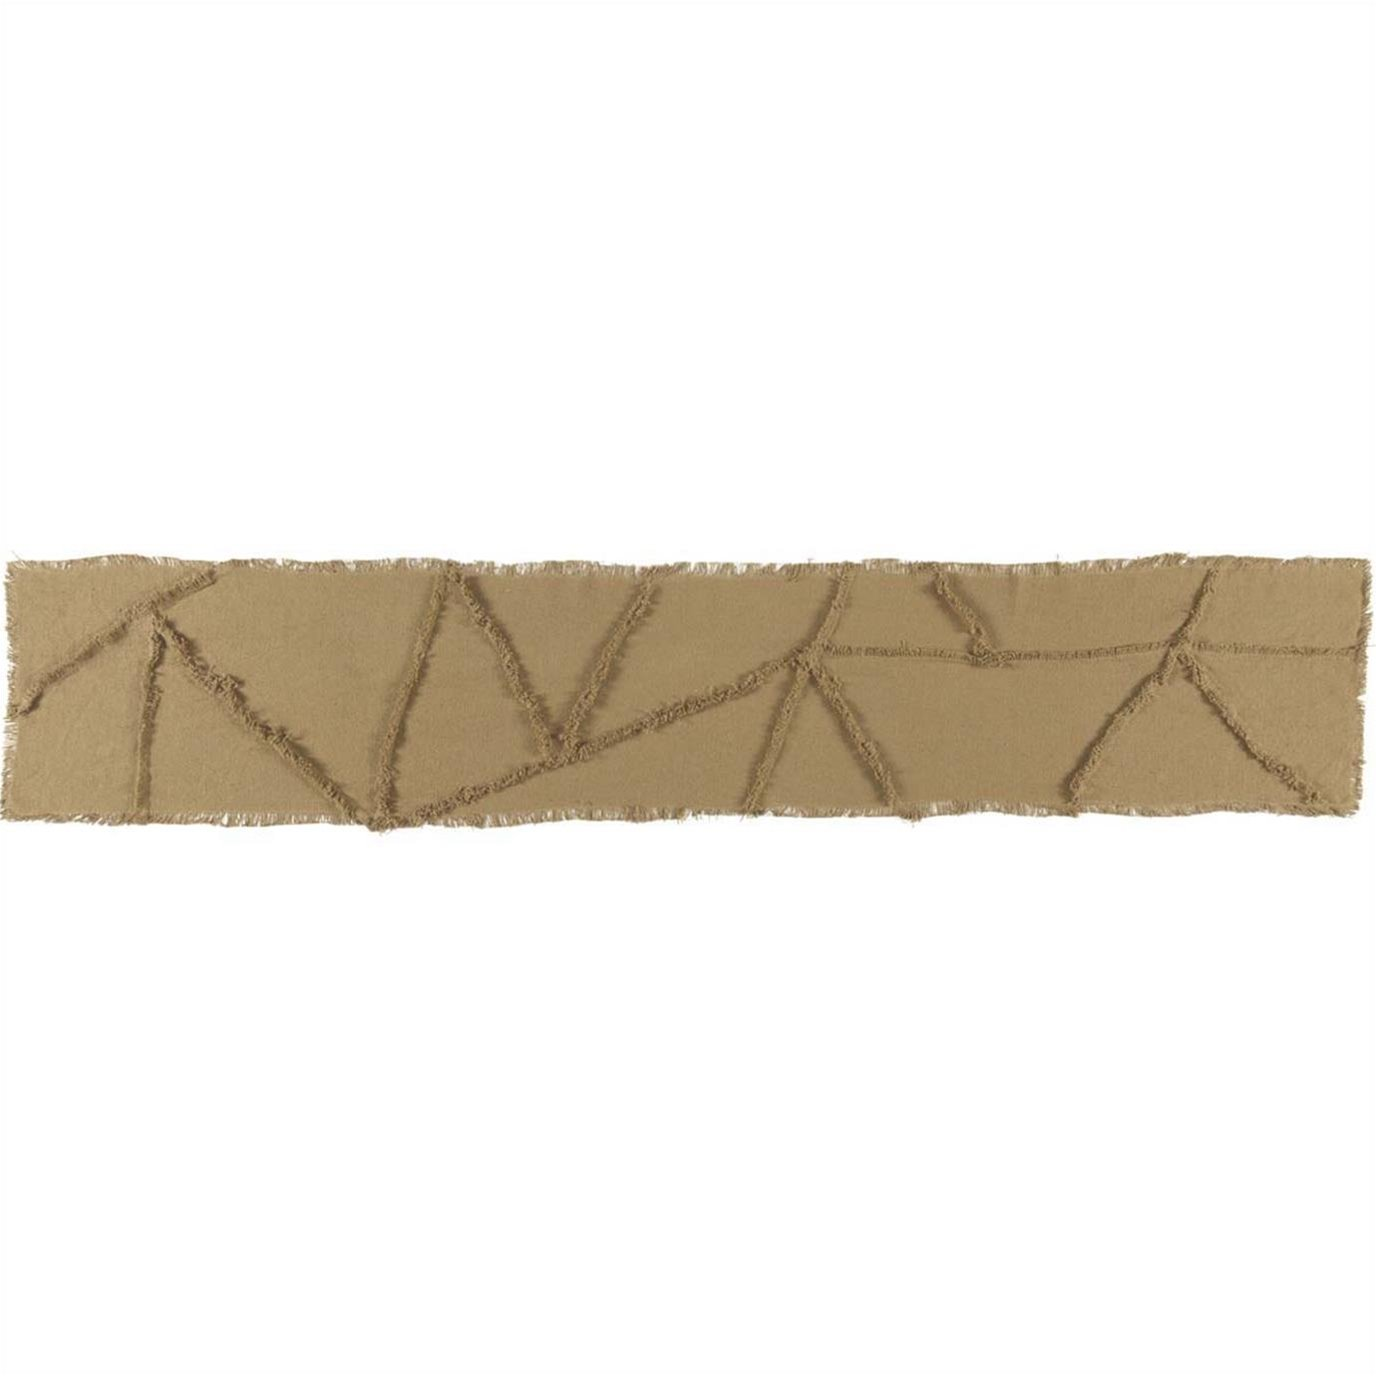 Burlap Natural Reverse Seam Patch Runner 13x72